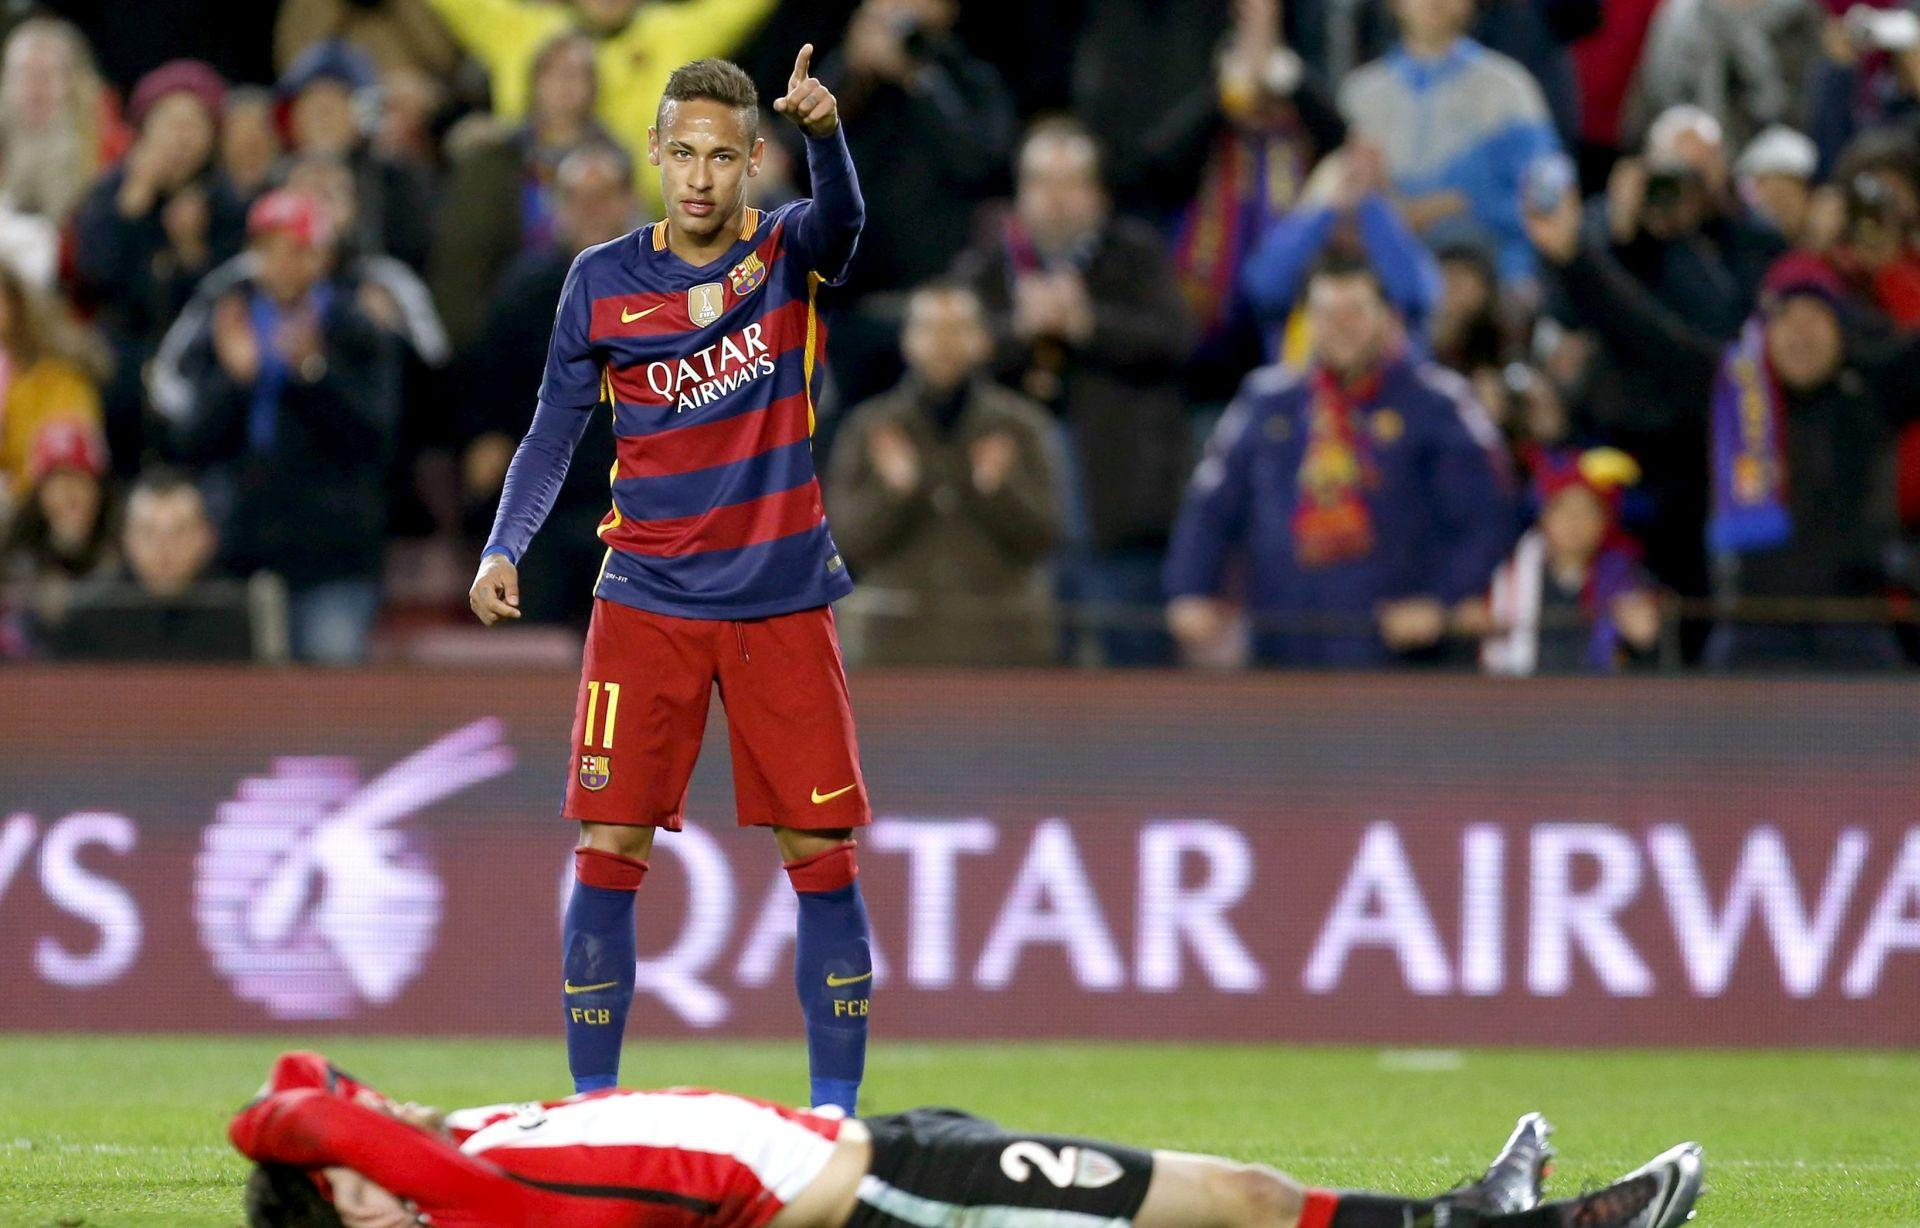 GODIŠNJA PLAĆA: Paris Saint-Germain nudi Neymaru 40 milijuna eura